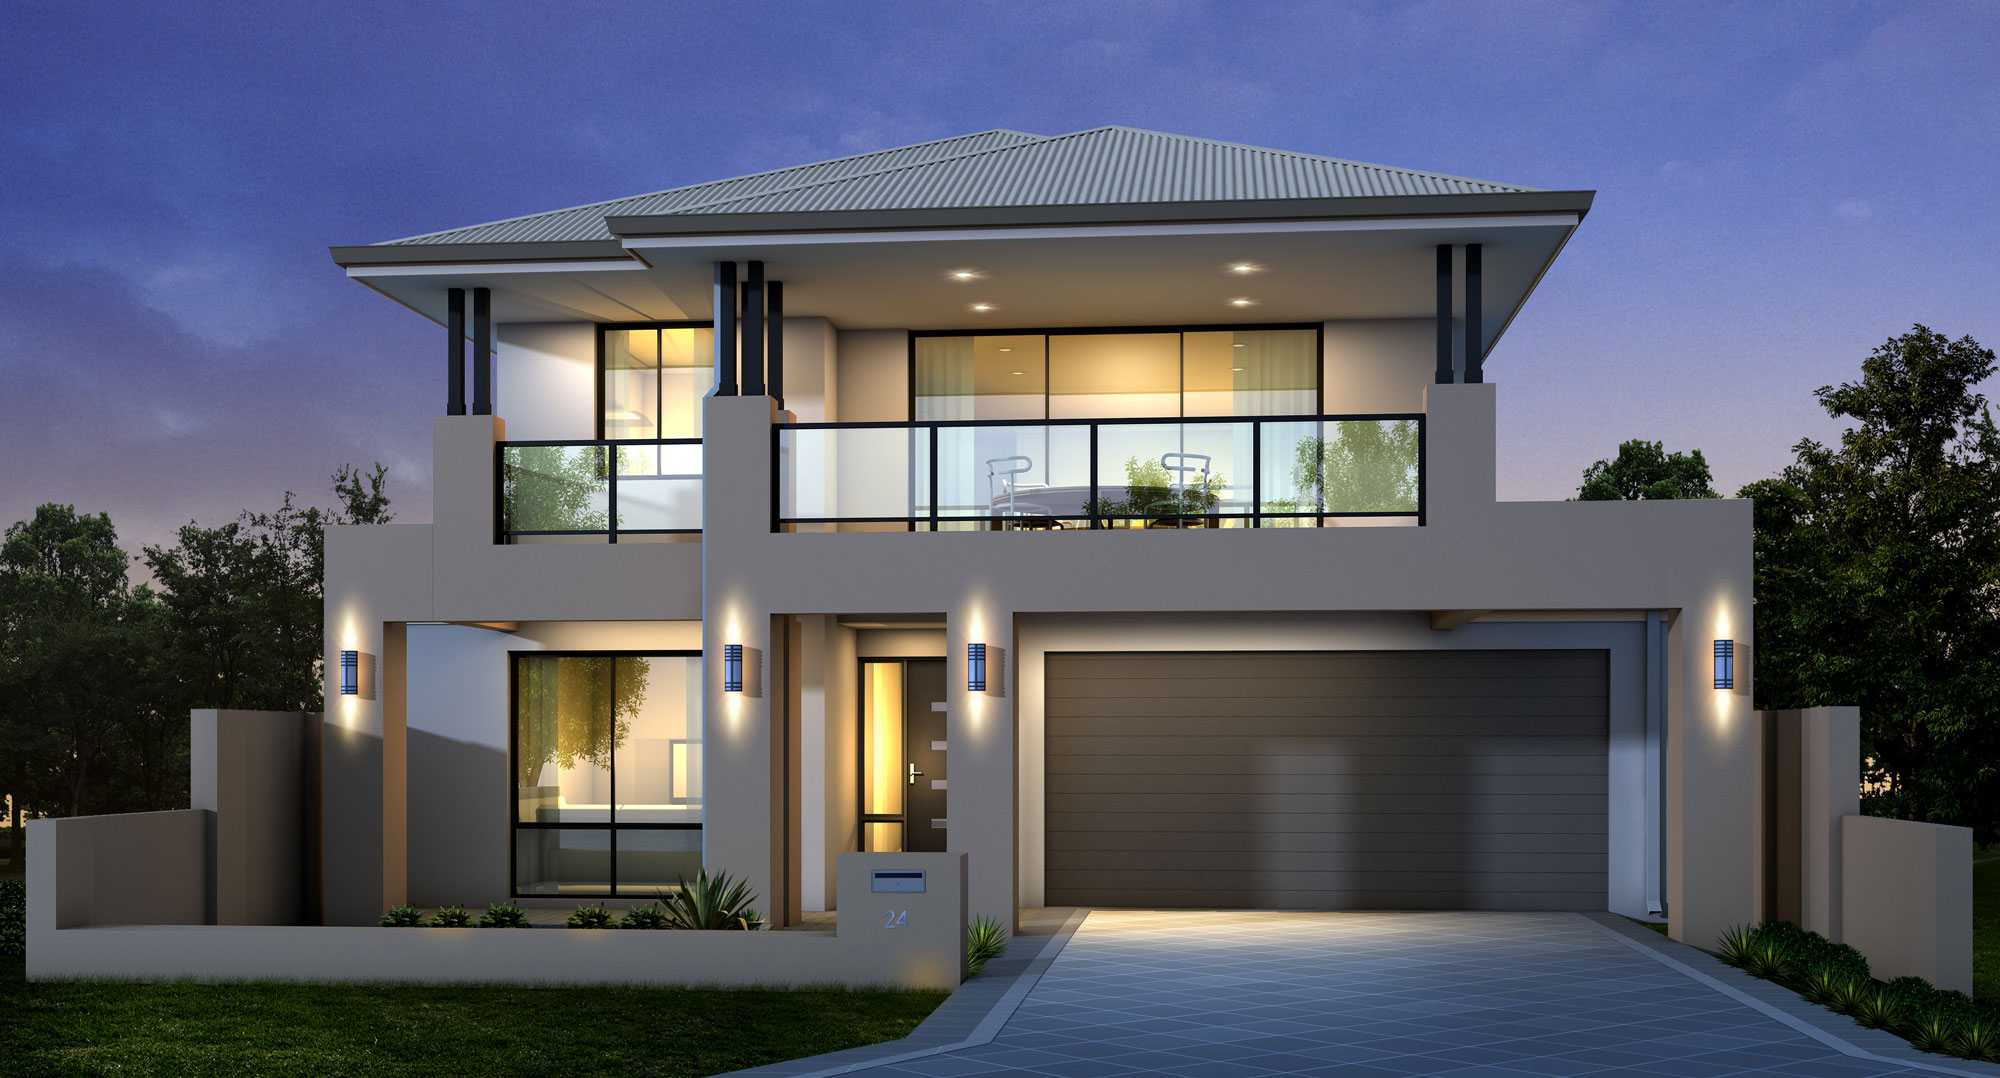 House Design Sample for Arcadia 2000